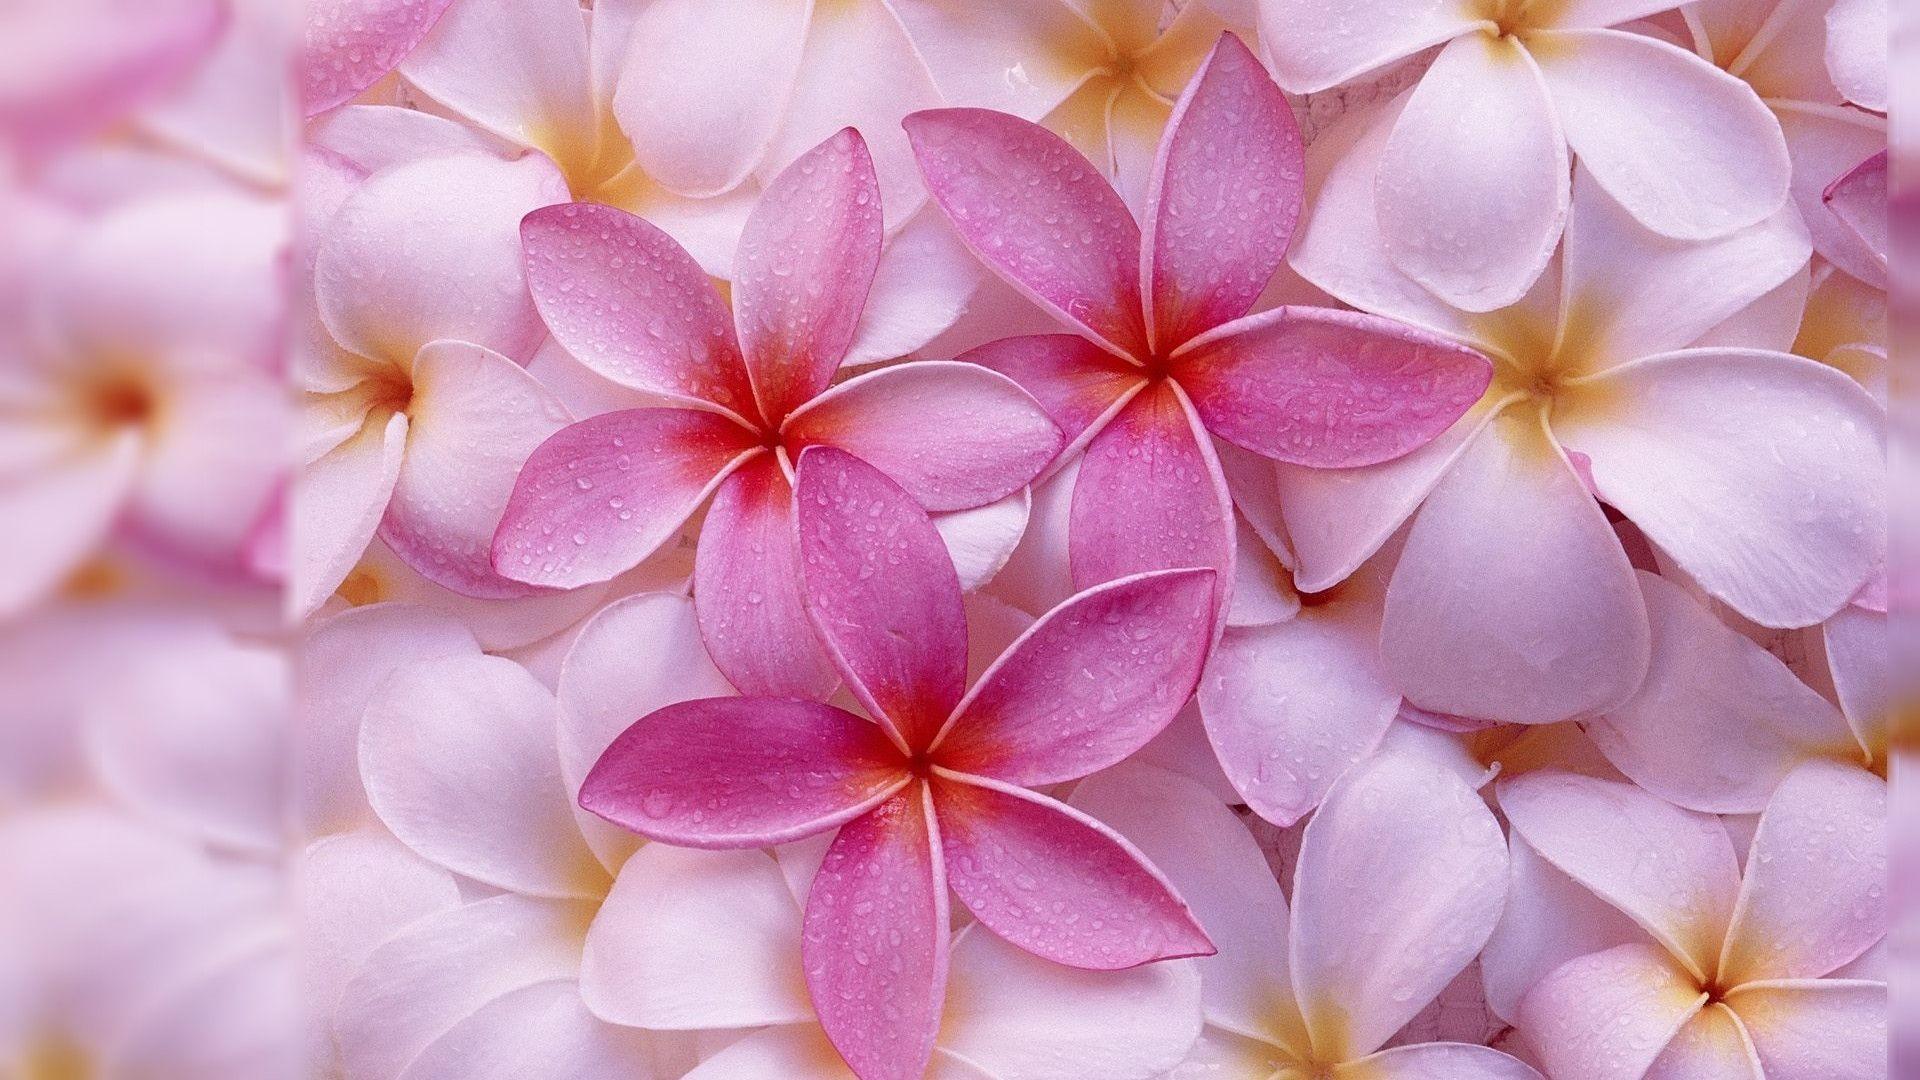 Flower Desktop Background Pictures 64 Pictures